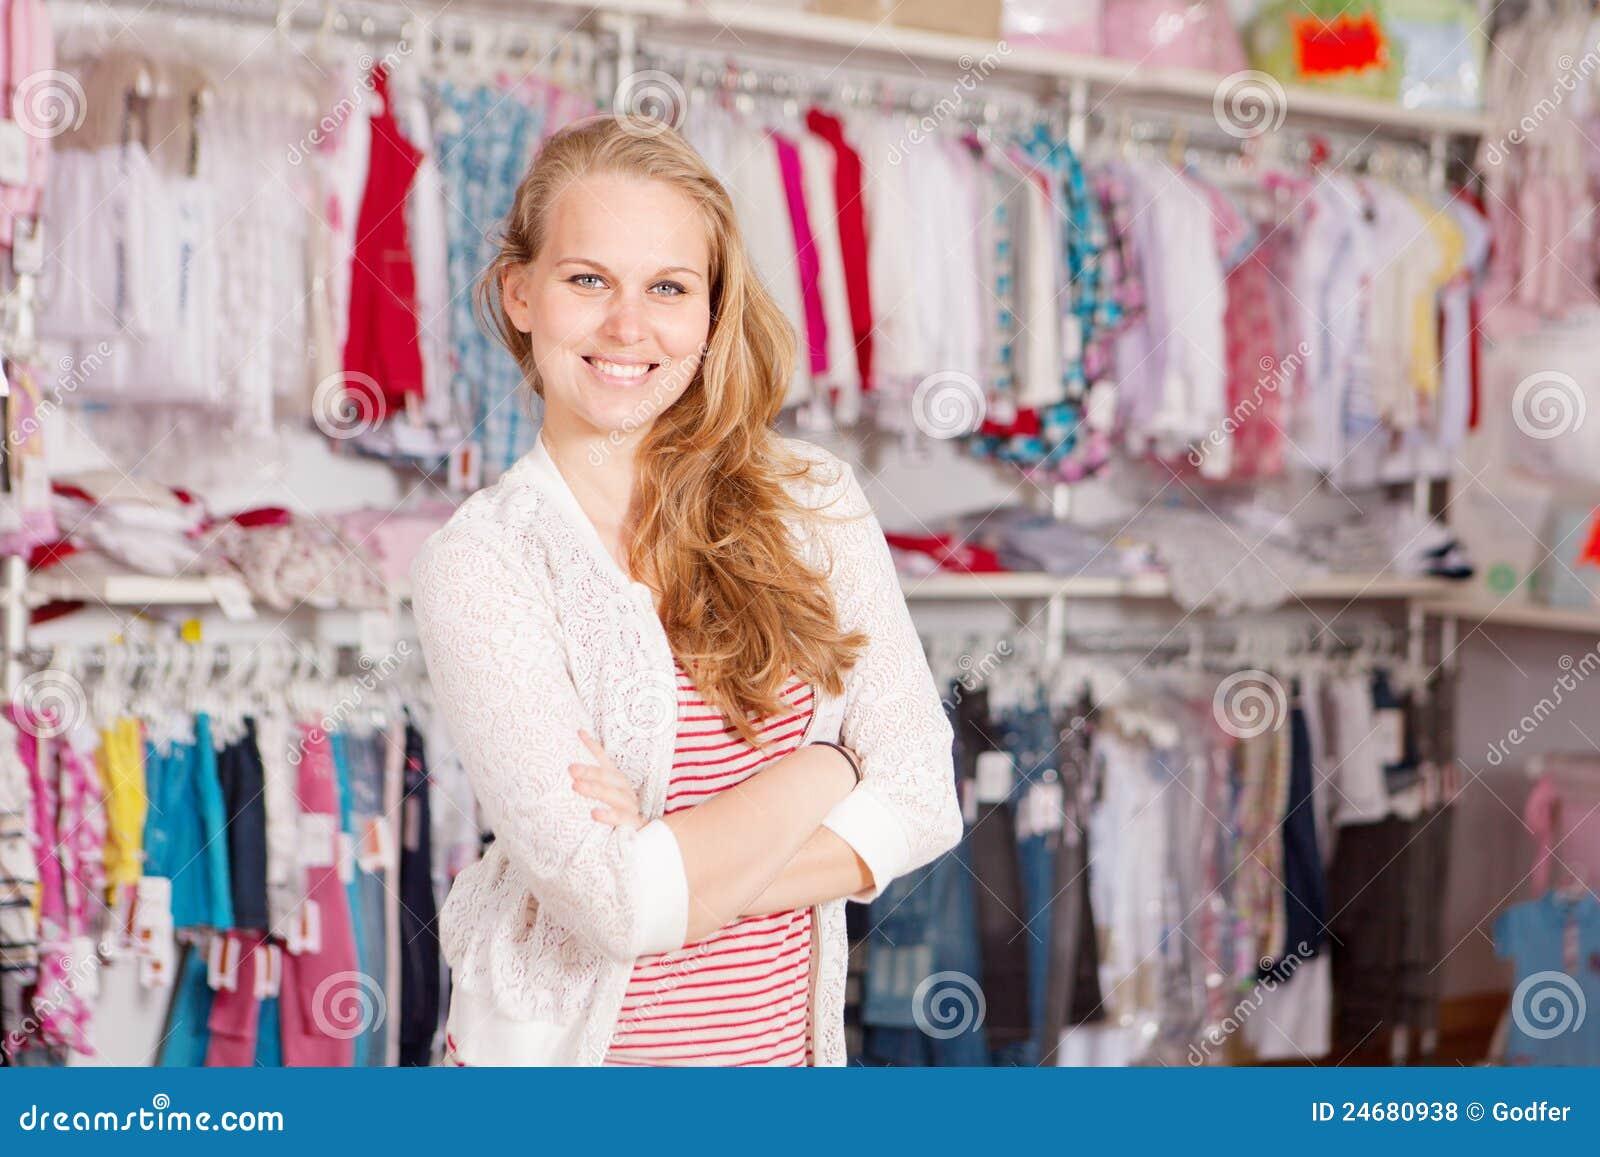 Import/Export Store